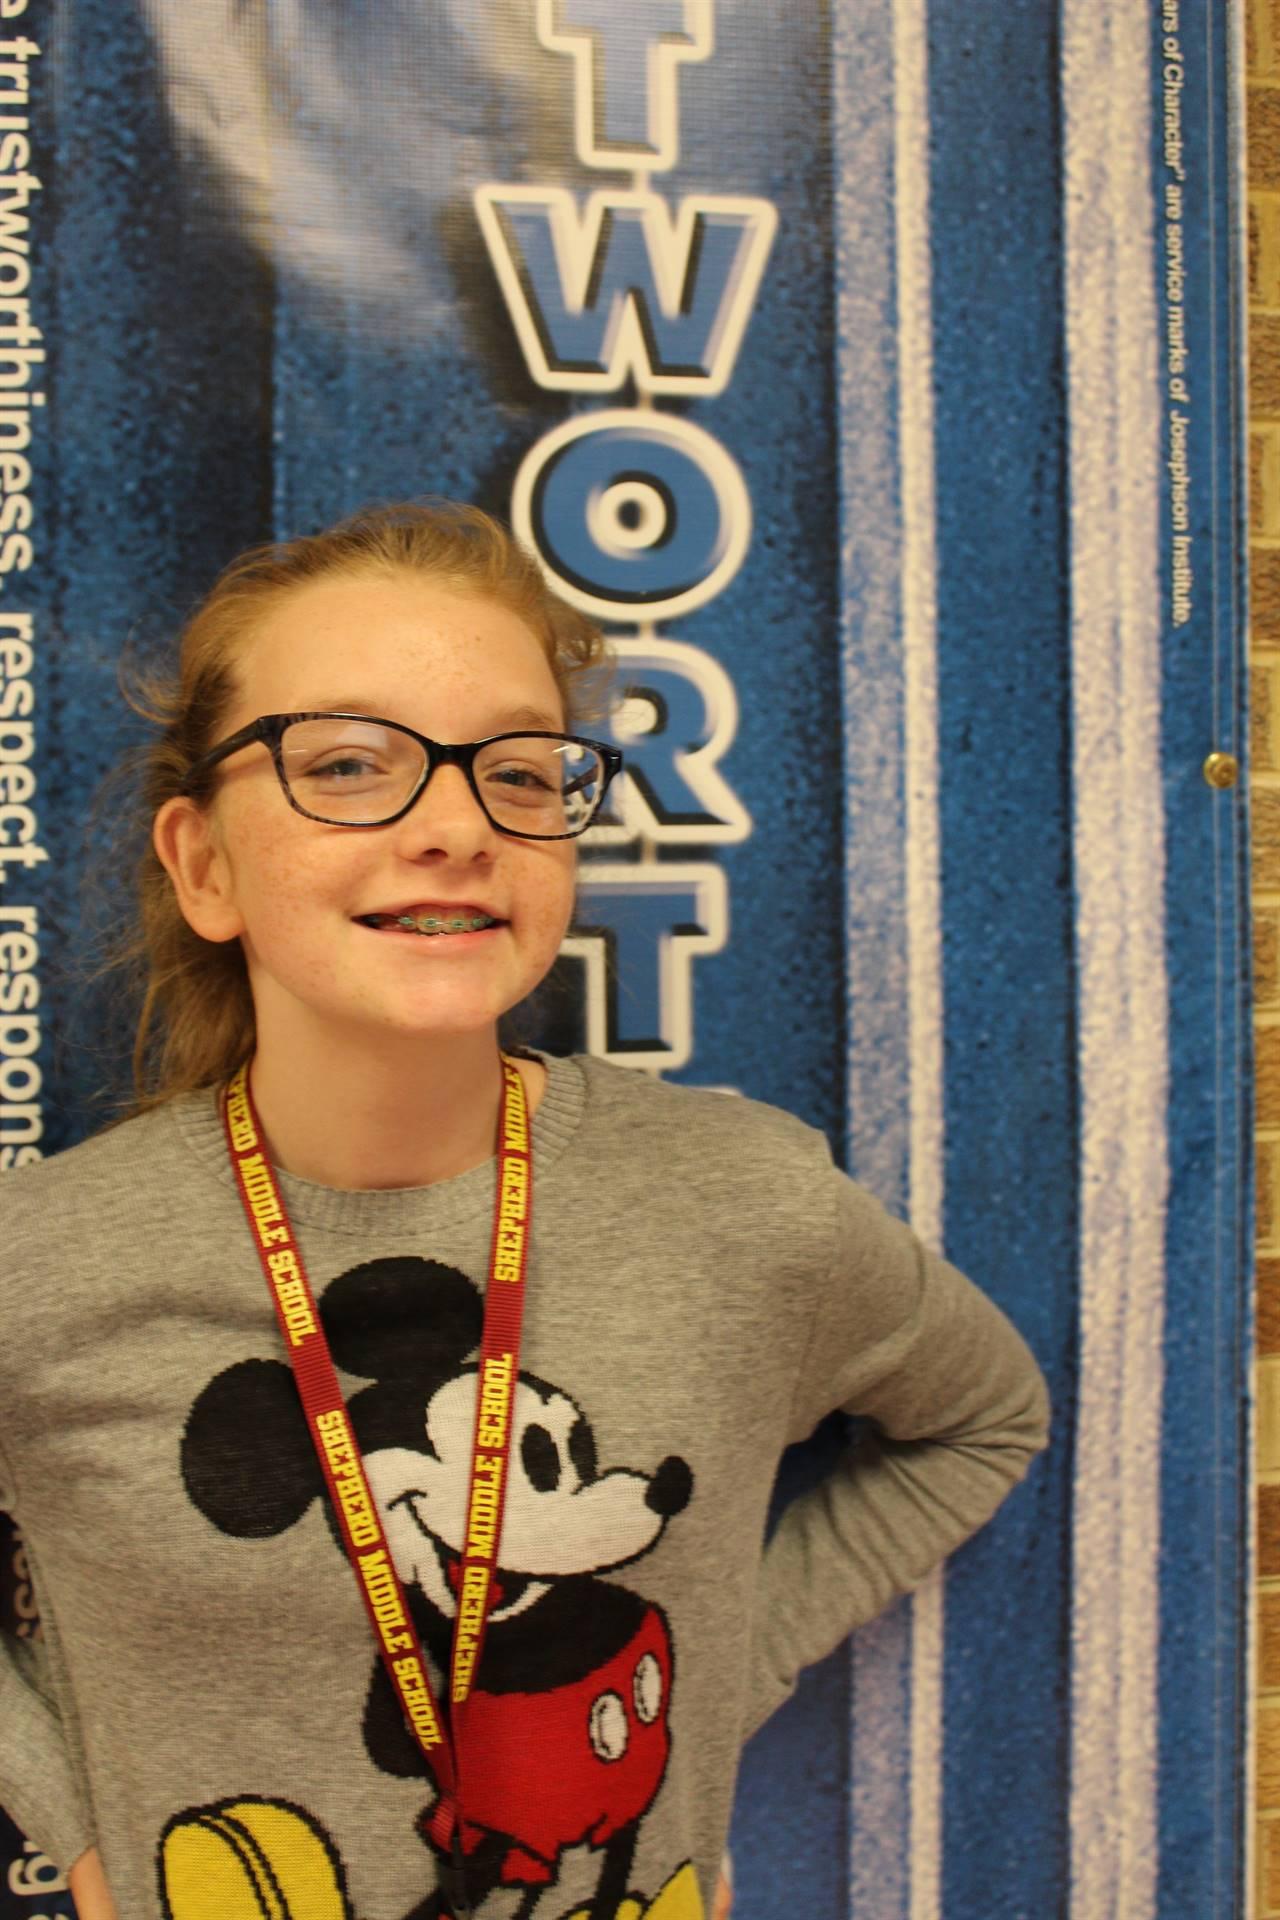 Lauren M. October - Student of Character (Trustworthiness)